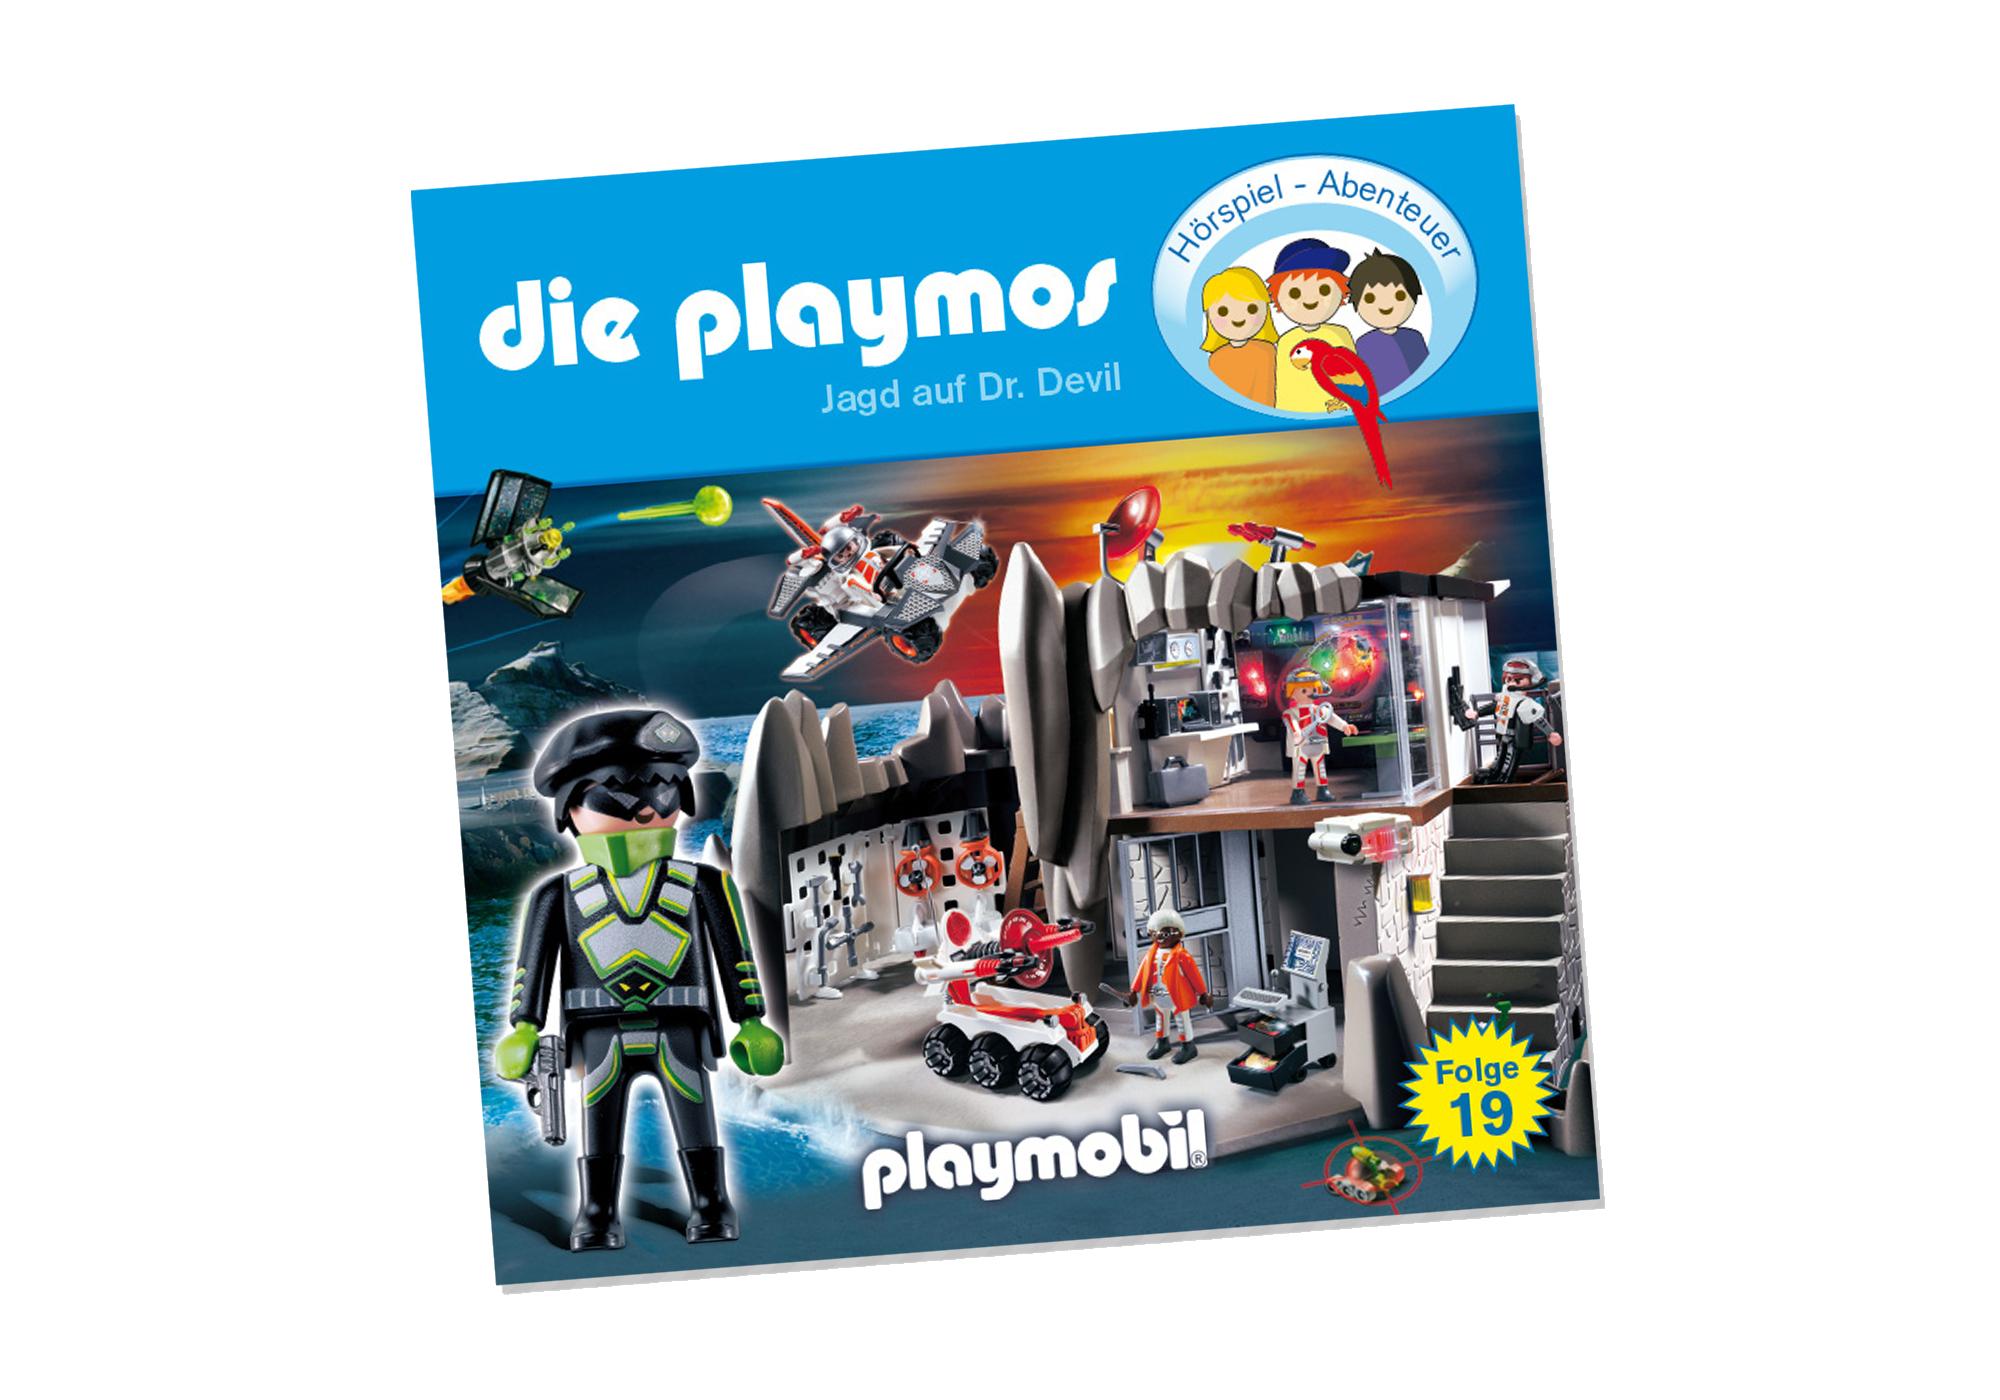 http://media.playmobil.com/i/playmobil/80272_product_detail